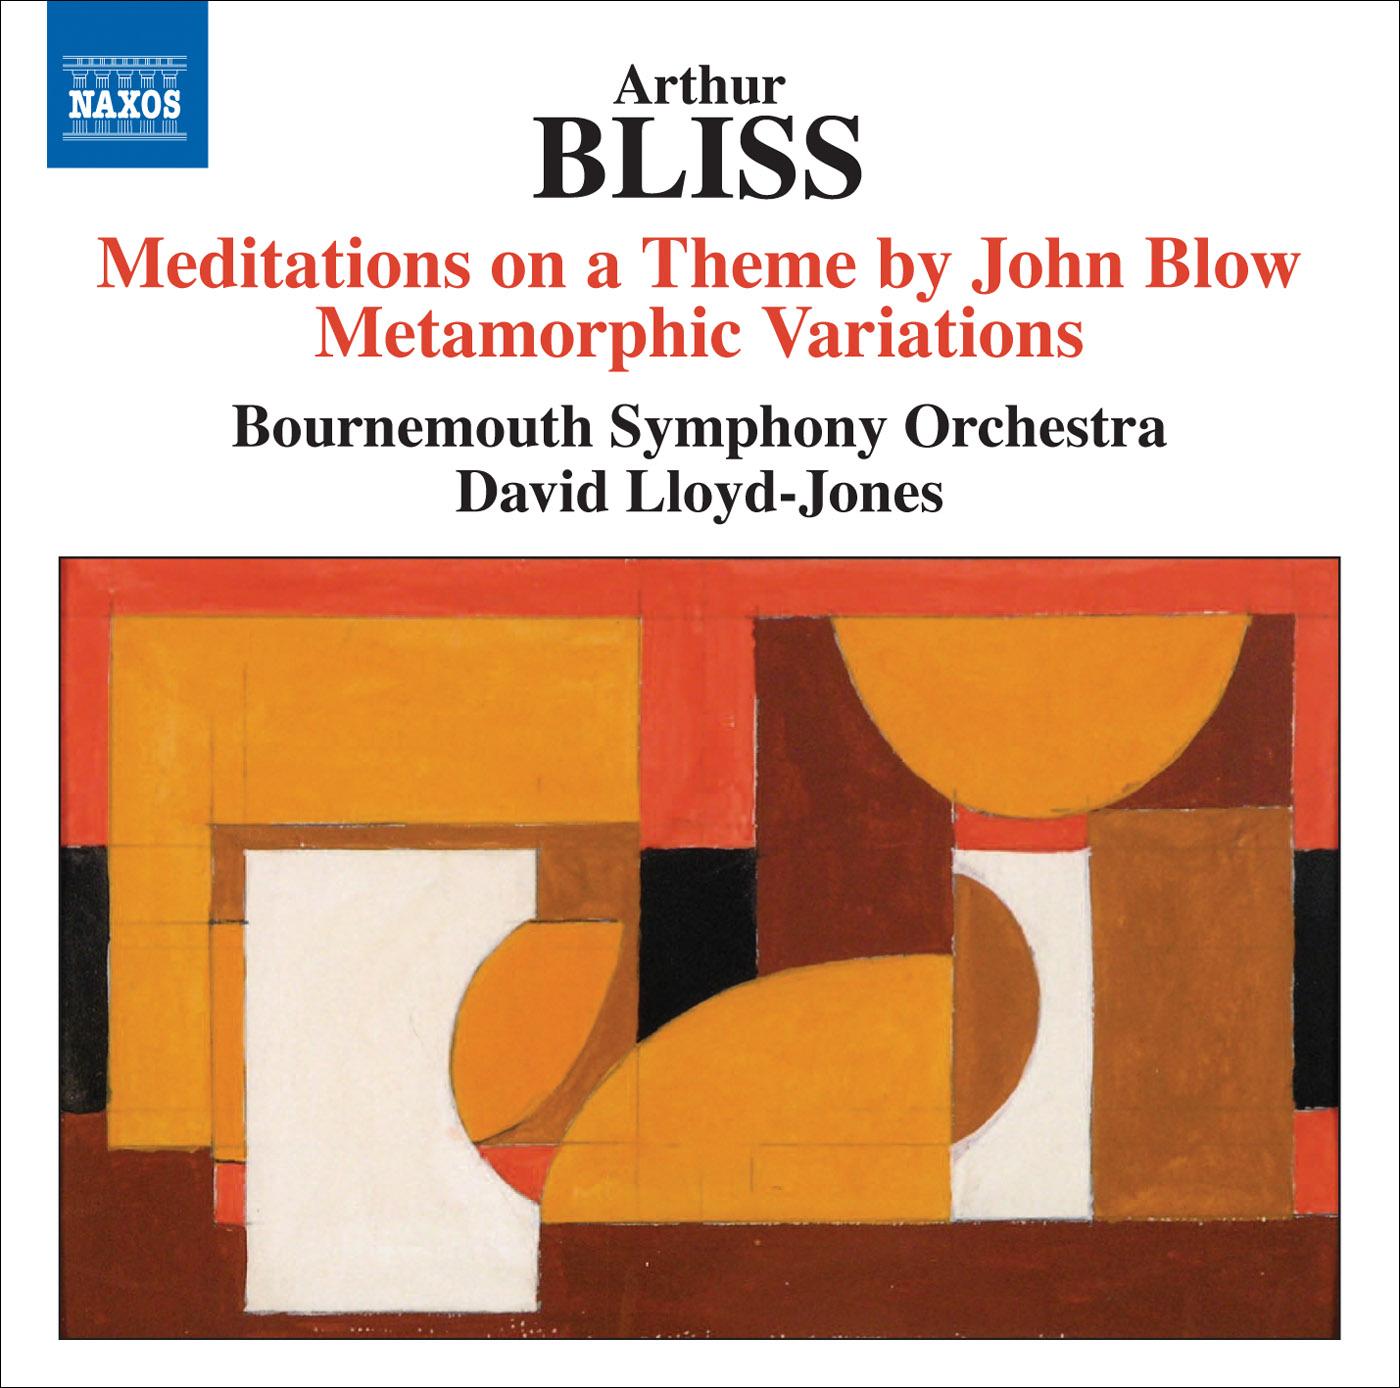 Lloyd Jones Illustration June 2011: BLISS, A.: Meditations On A Theme By John Blow